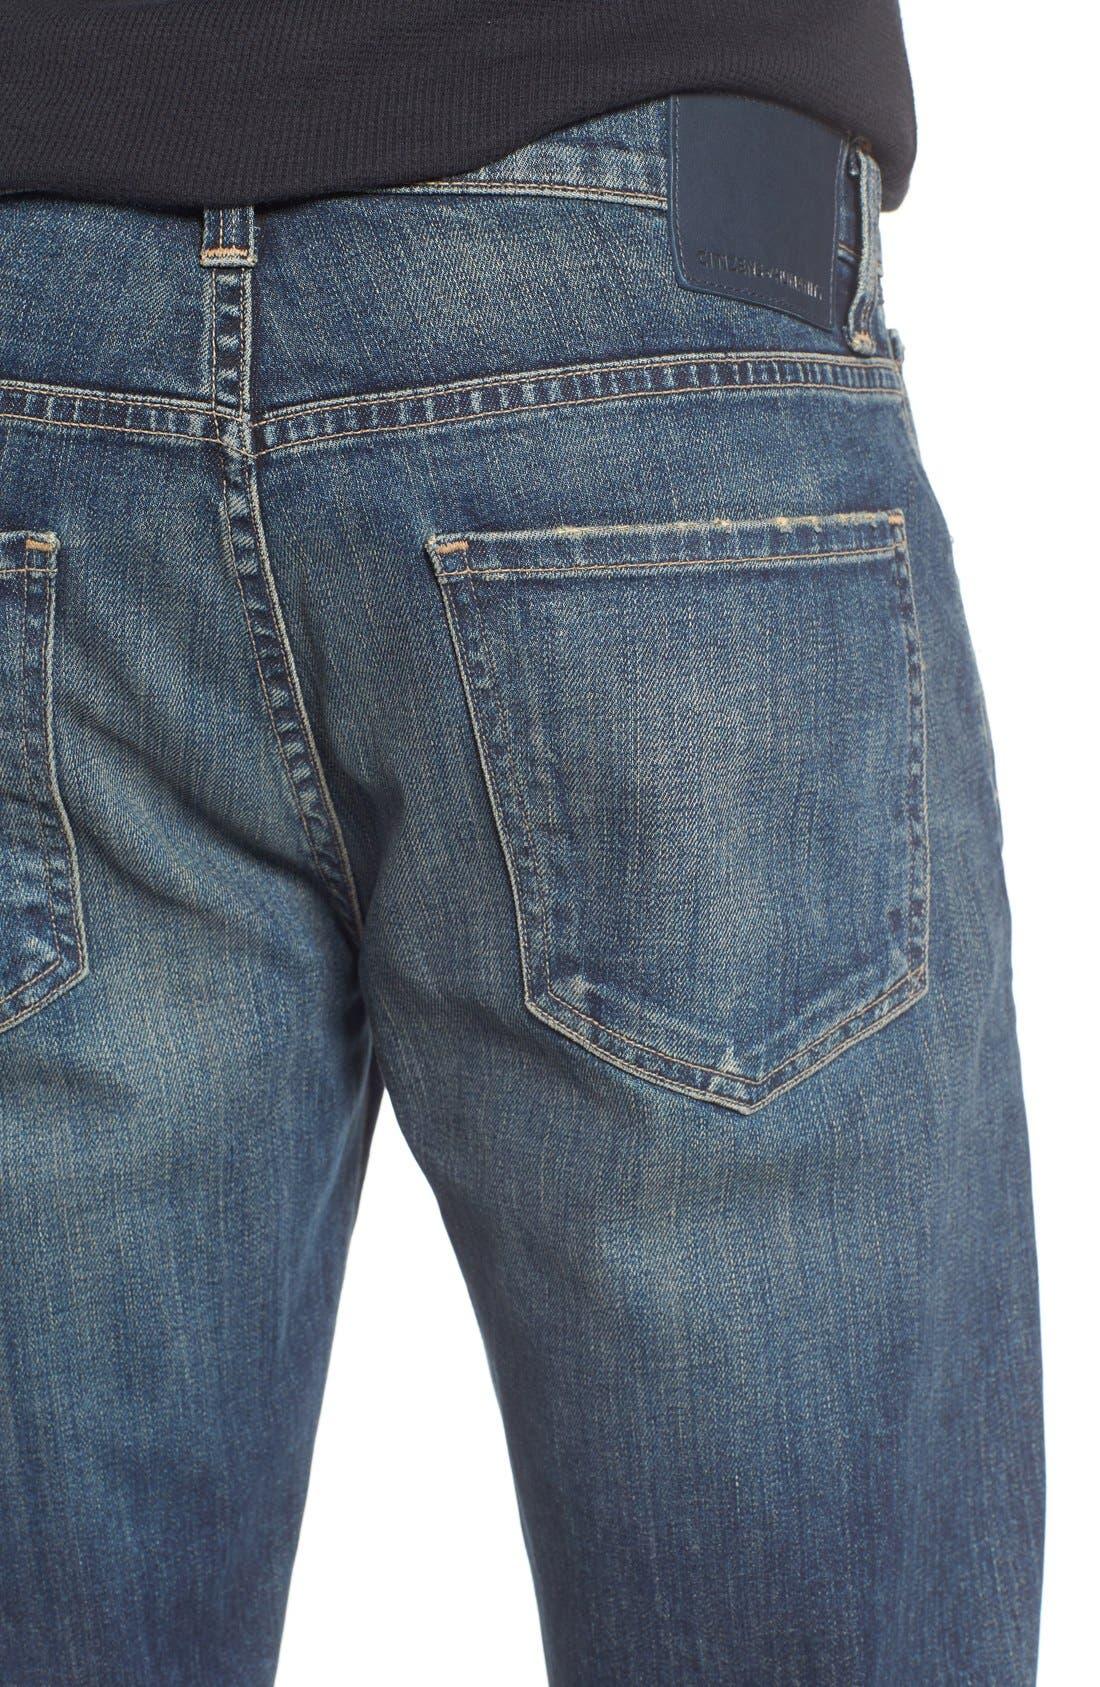 Gage Slim Straight Leg Jeans,                             Alternate thumbnail 10, color,                             DUNES